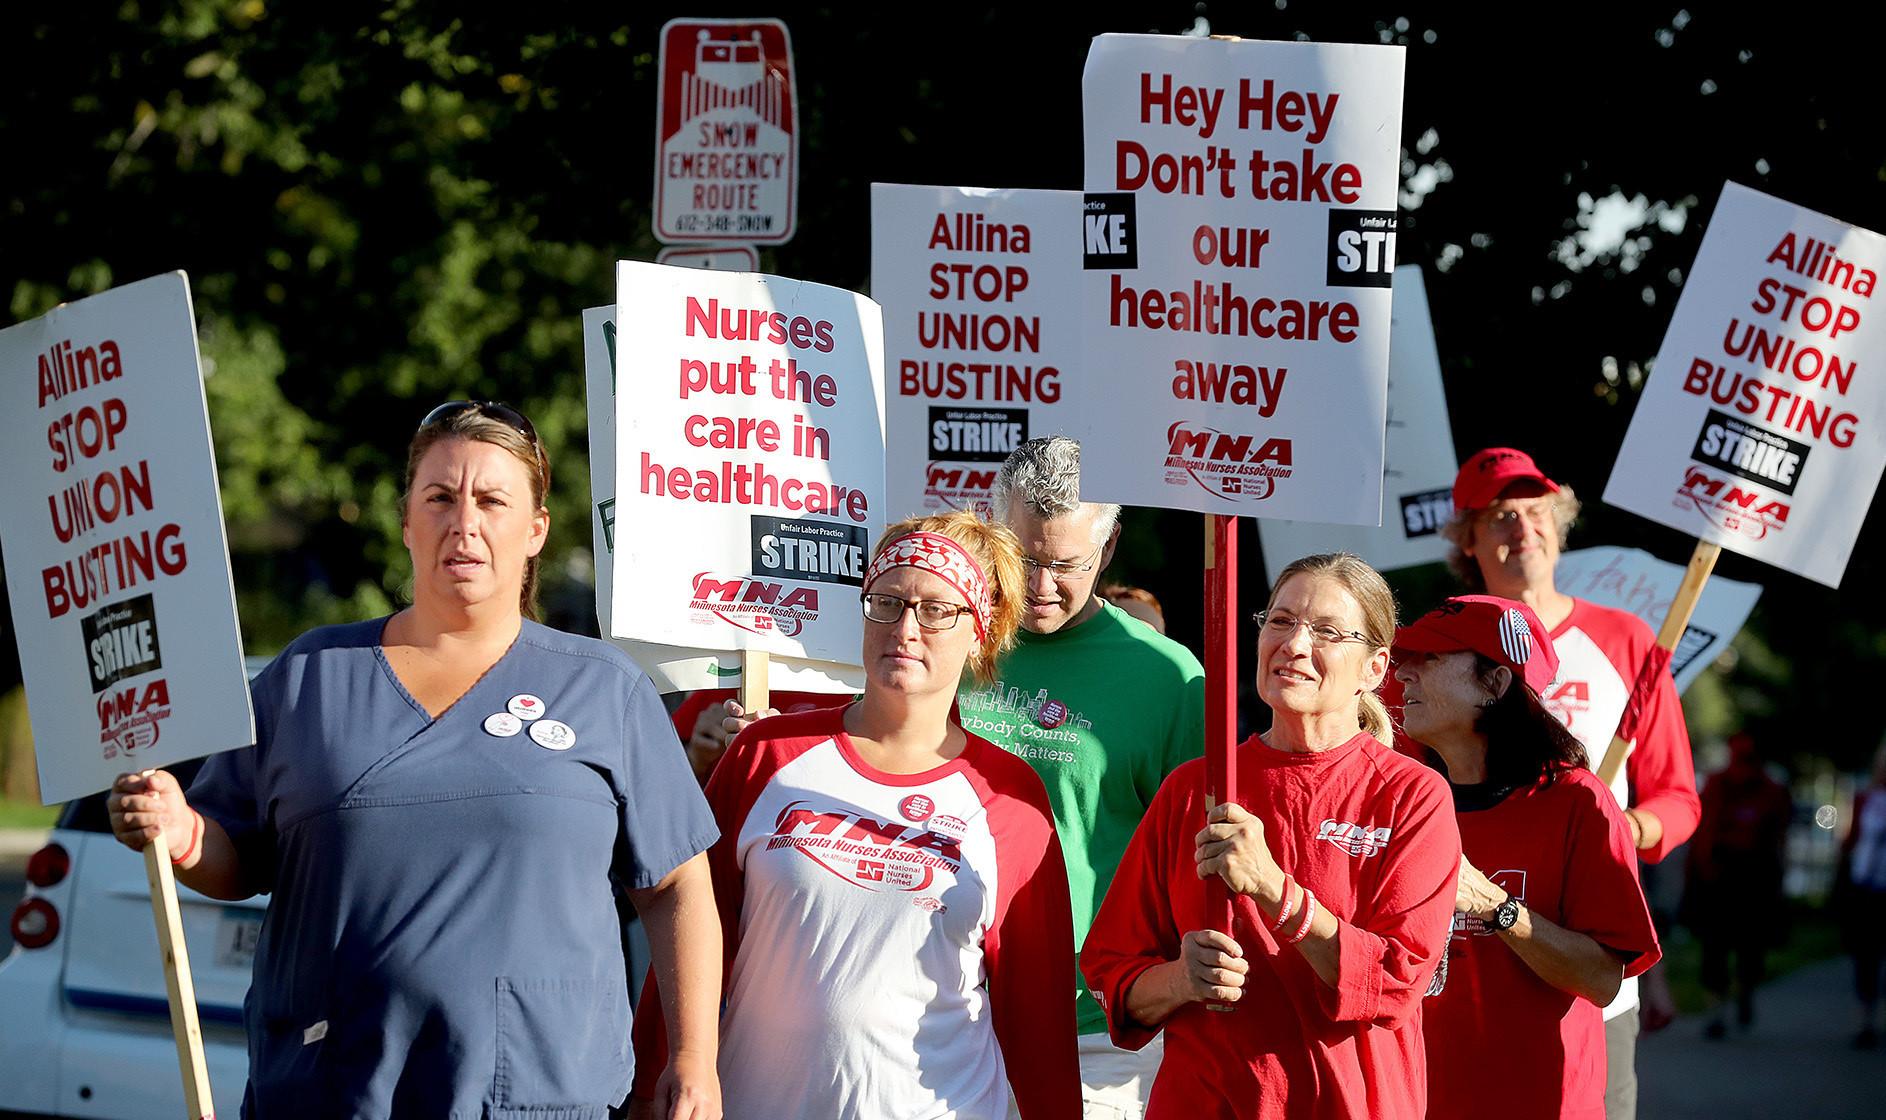 Striking nurses, Allina Health agree to bargaining session